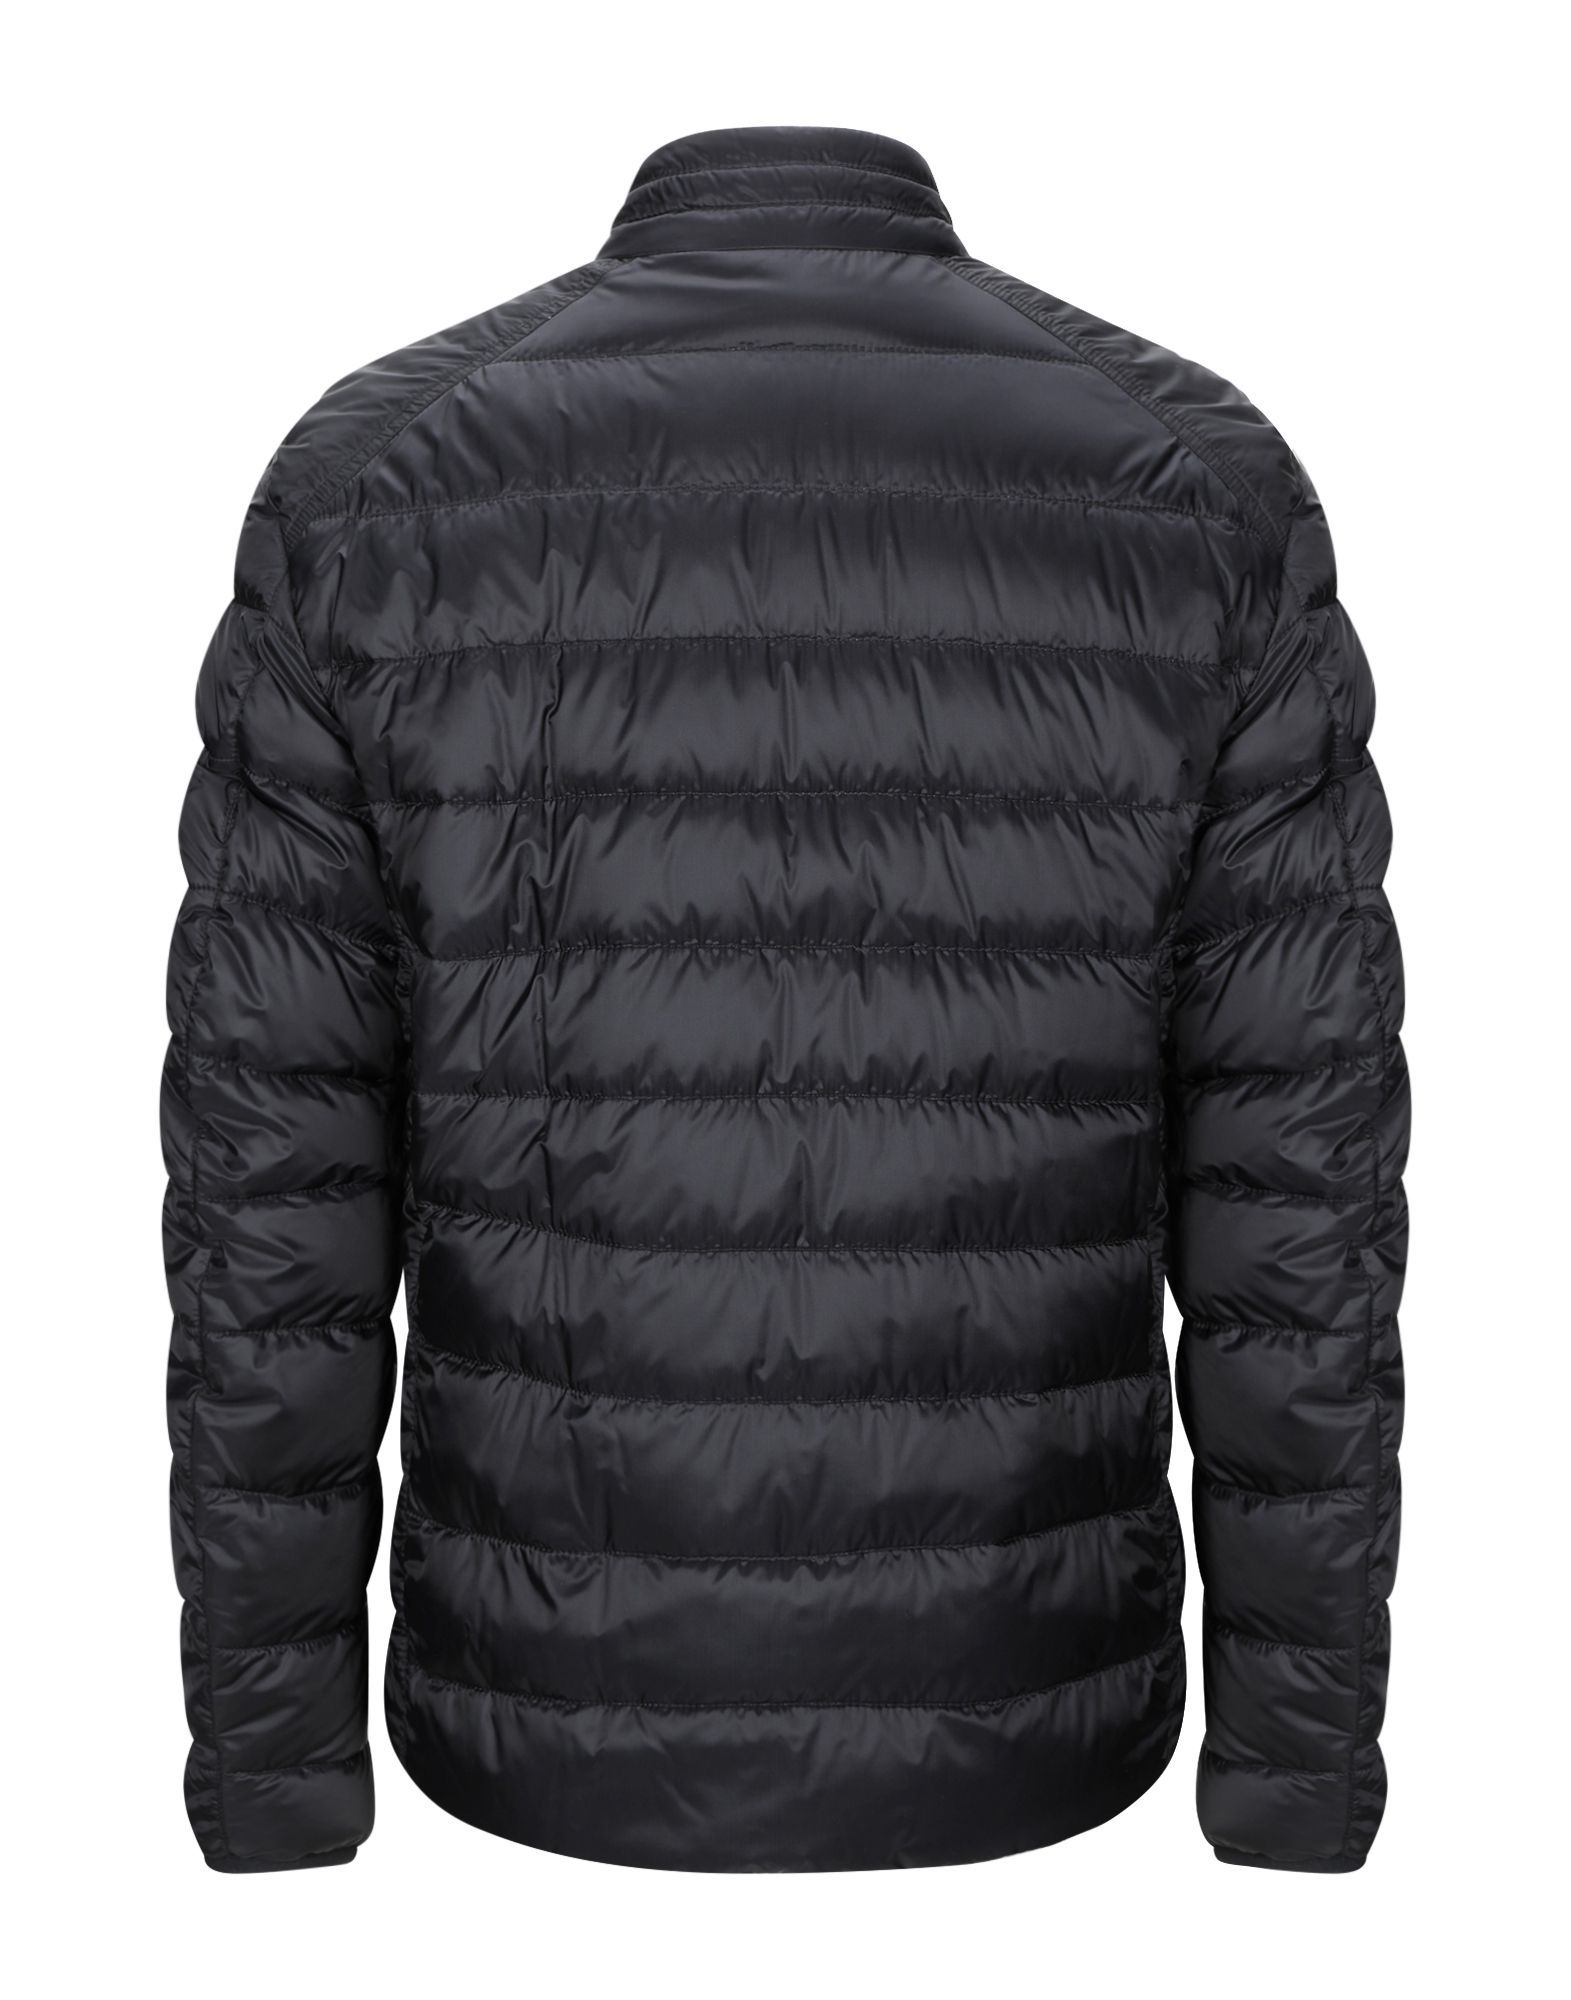 Belstaff Black Techno Fabric Jacket